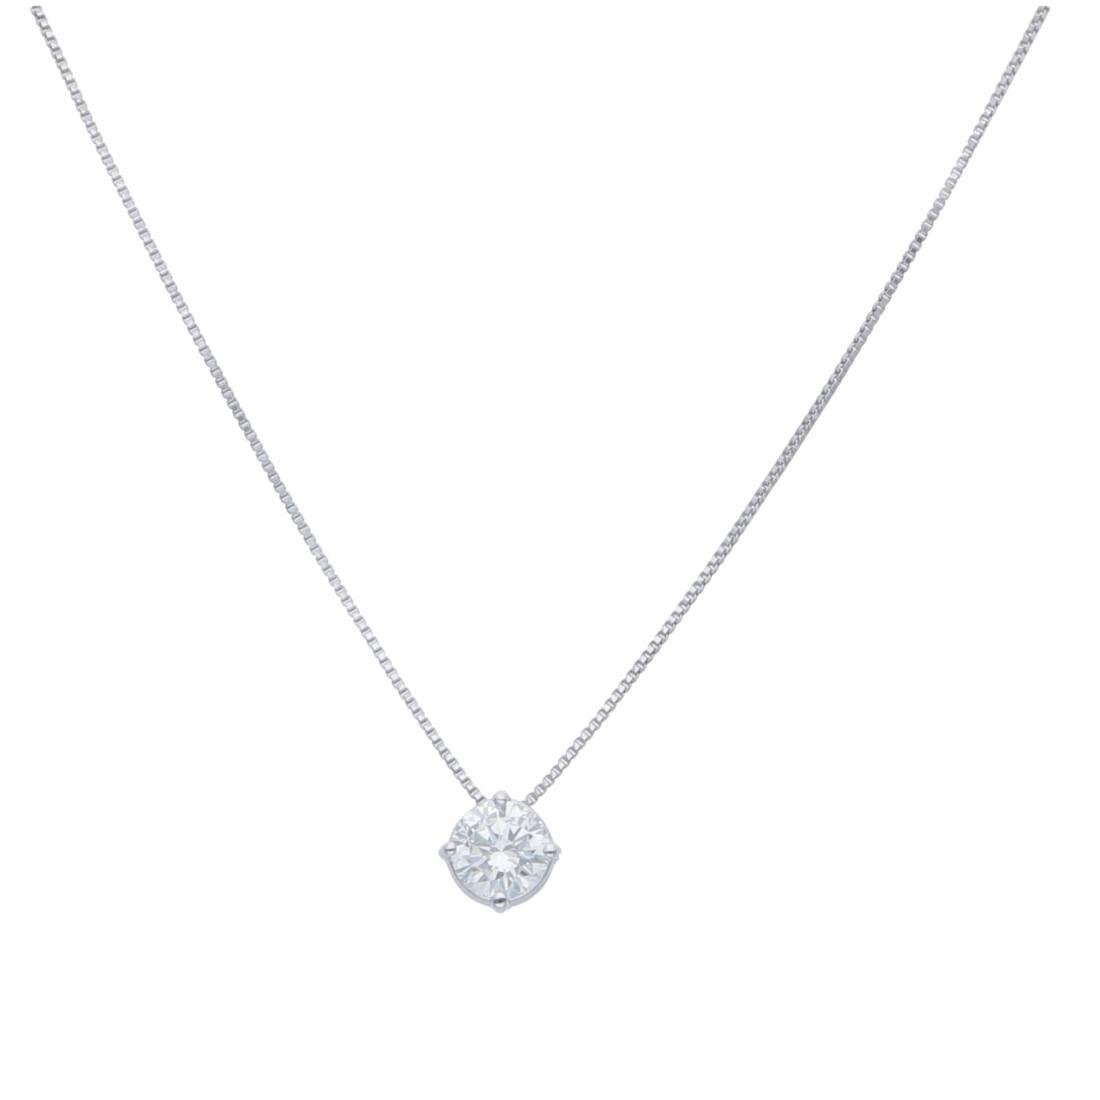 Collana punto luce con diamanti ct 0,45 - ALFIERI & ST. JOHN